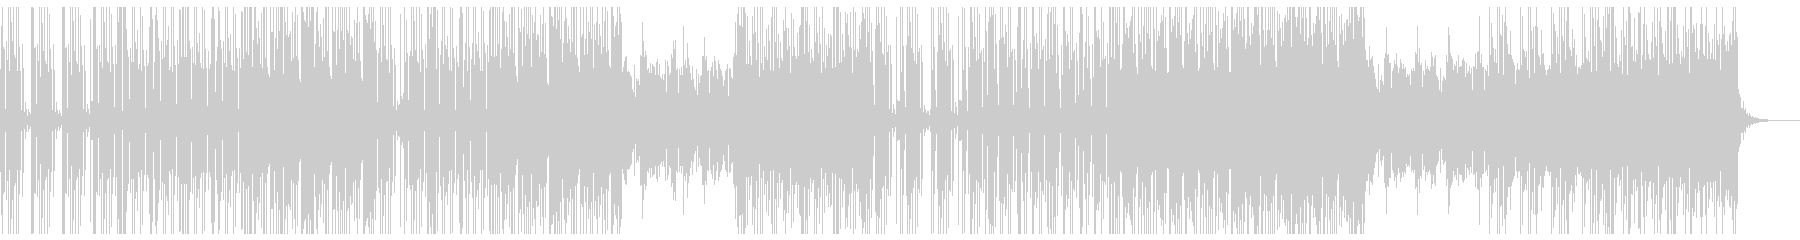 100BPM・Electro・DnBの未再生の波形